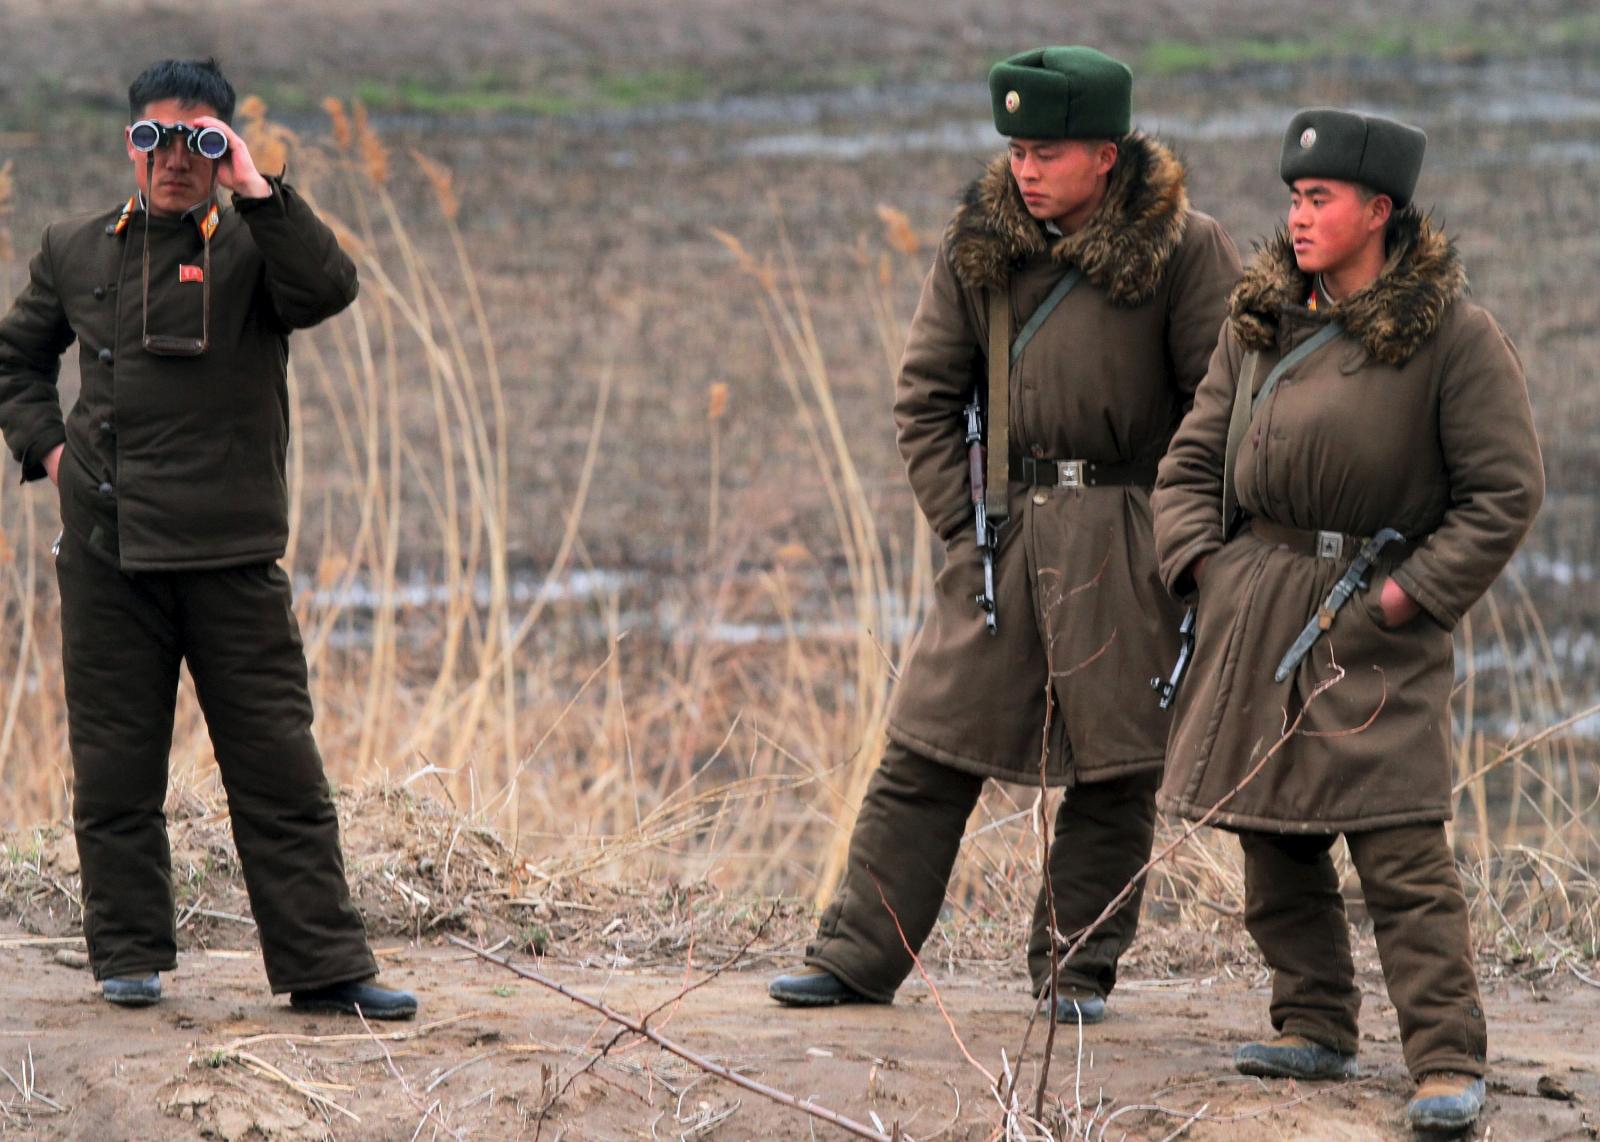 North Korea soldier defects